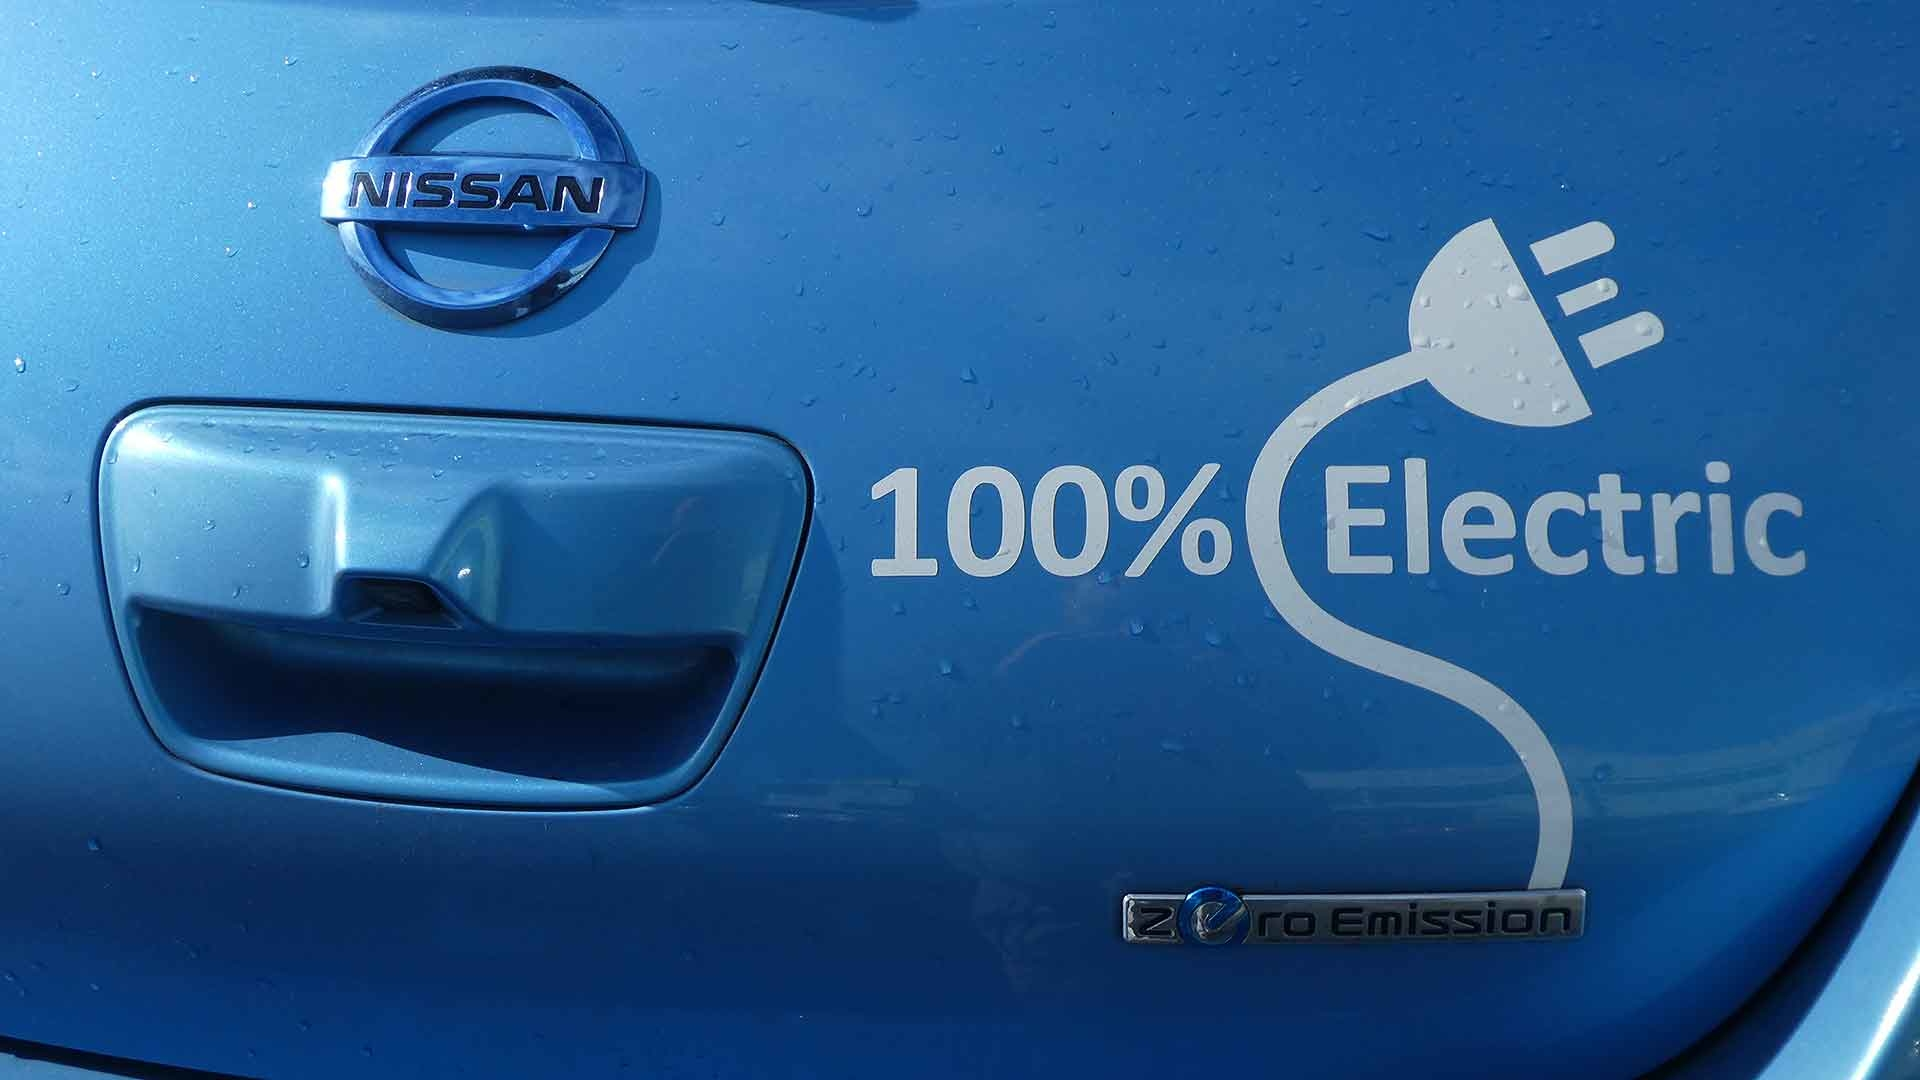 Nissan Leaf wearing a 100% electric logo